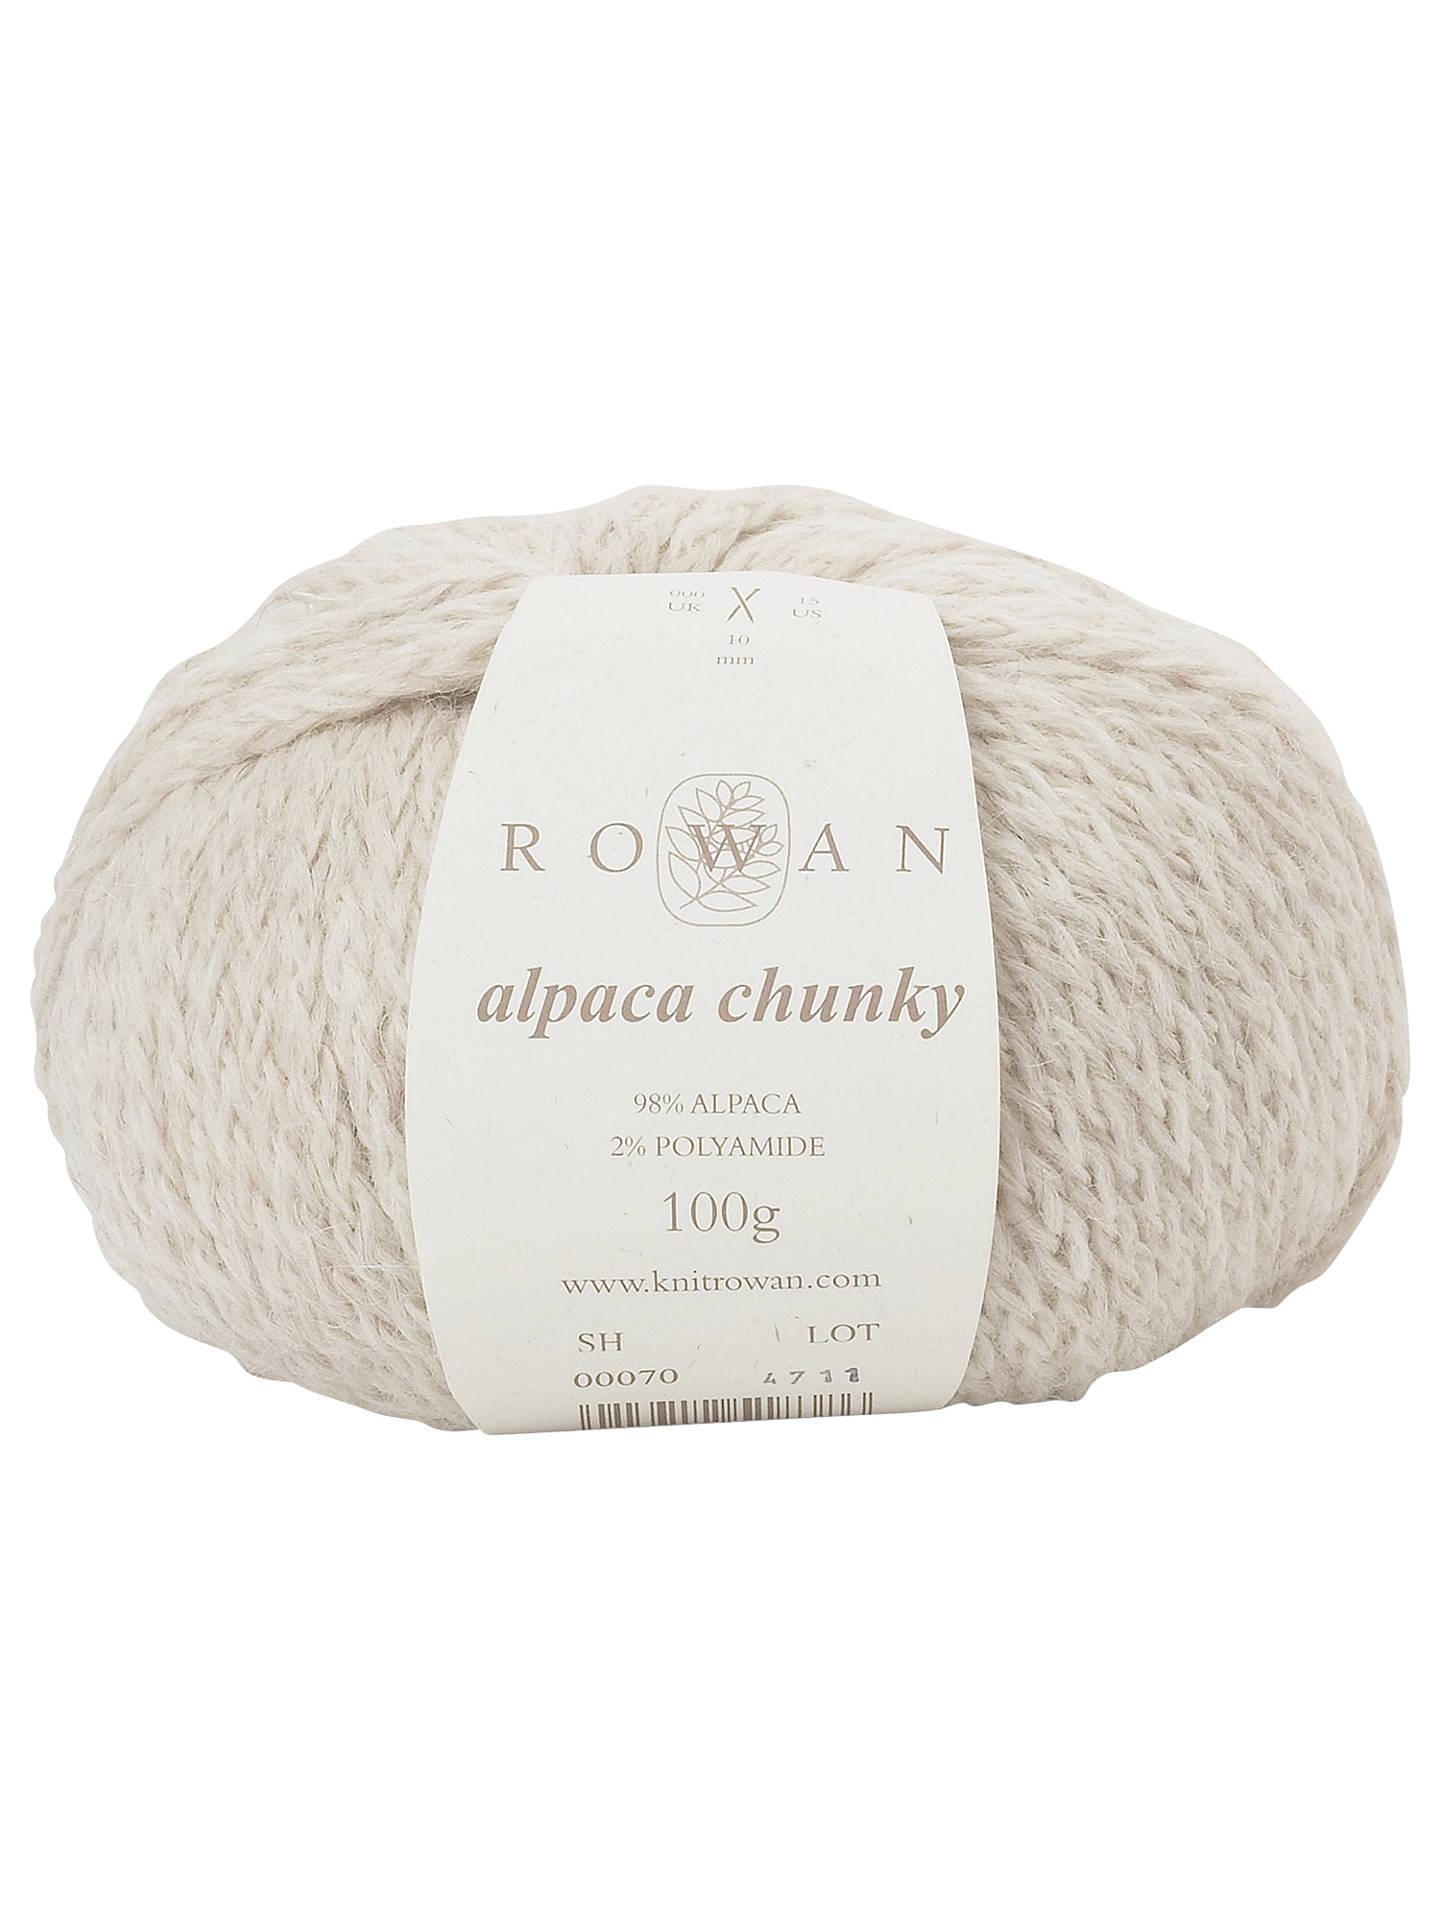 6f69e21db2e Buy Rowan Alpaca Chunky Yarn